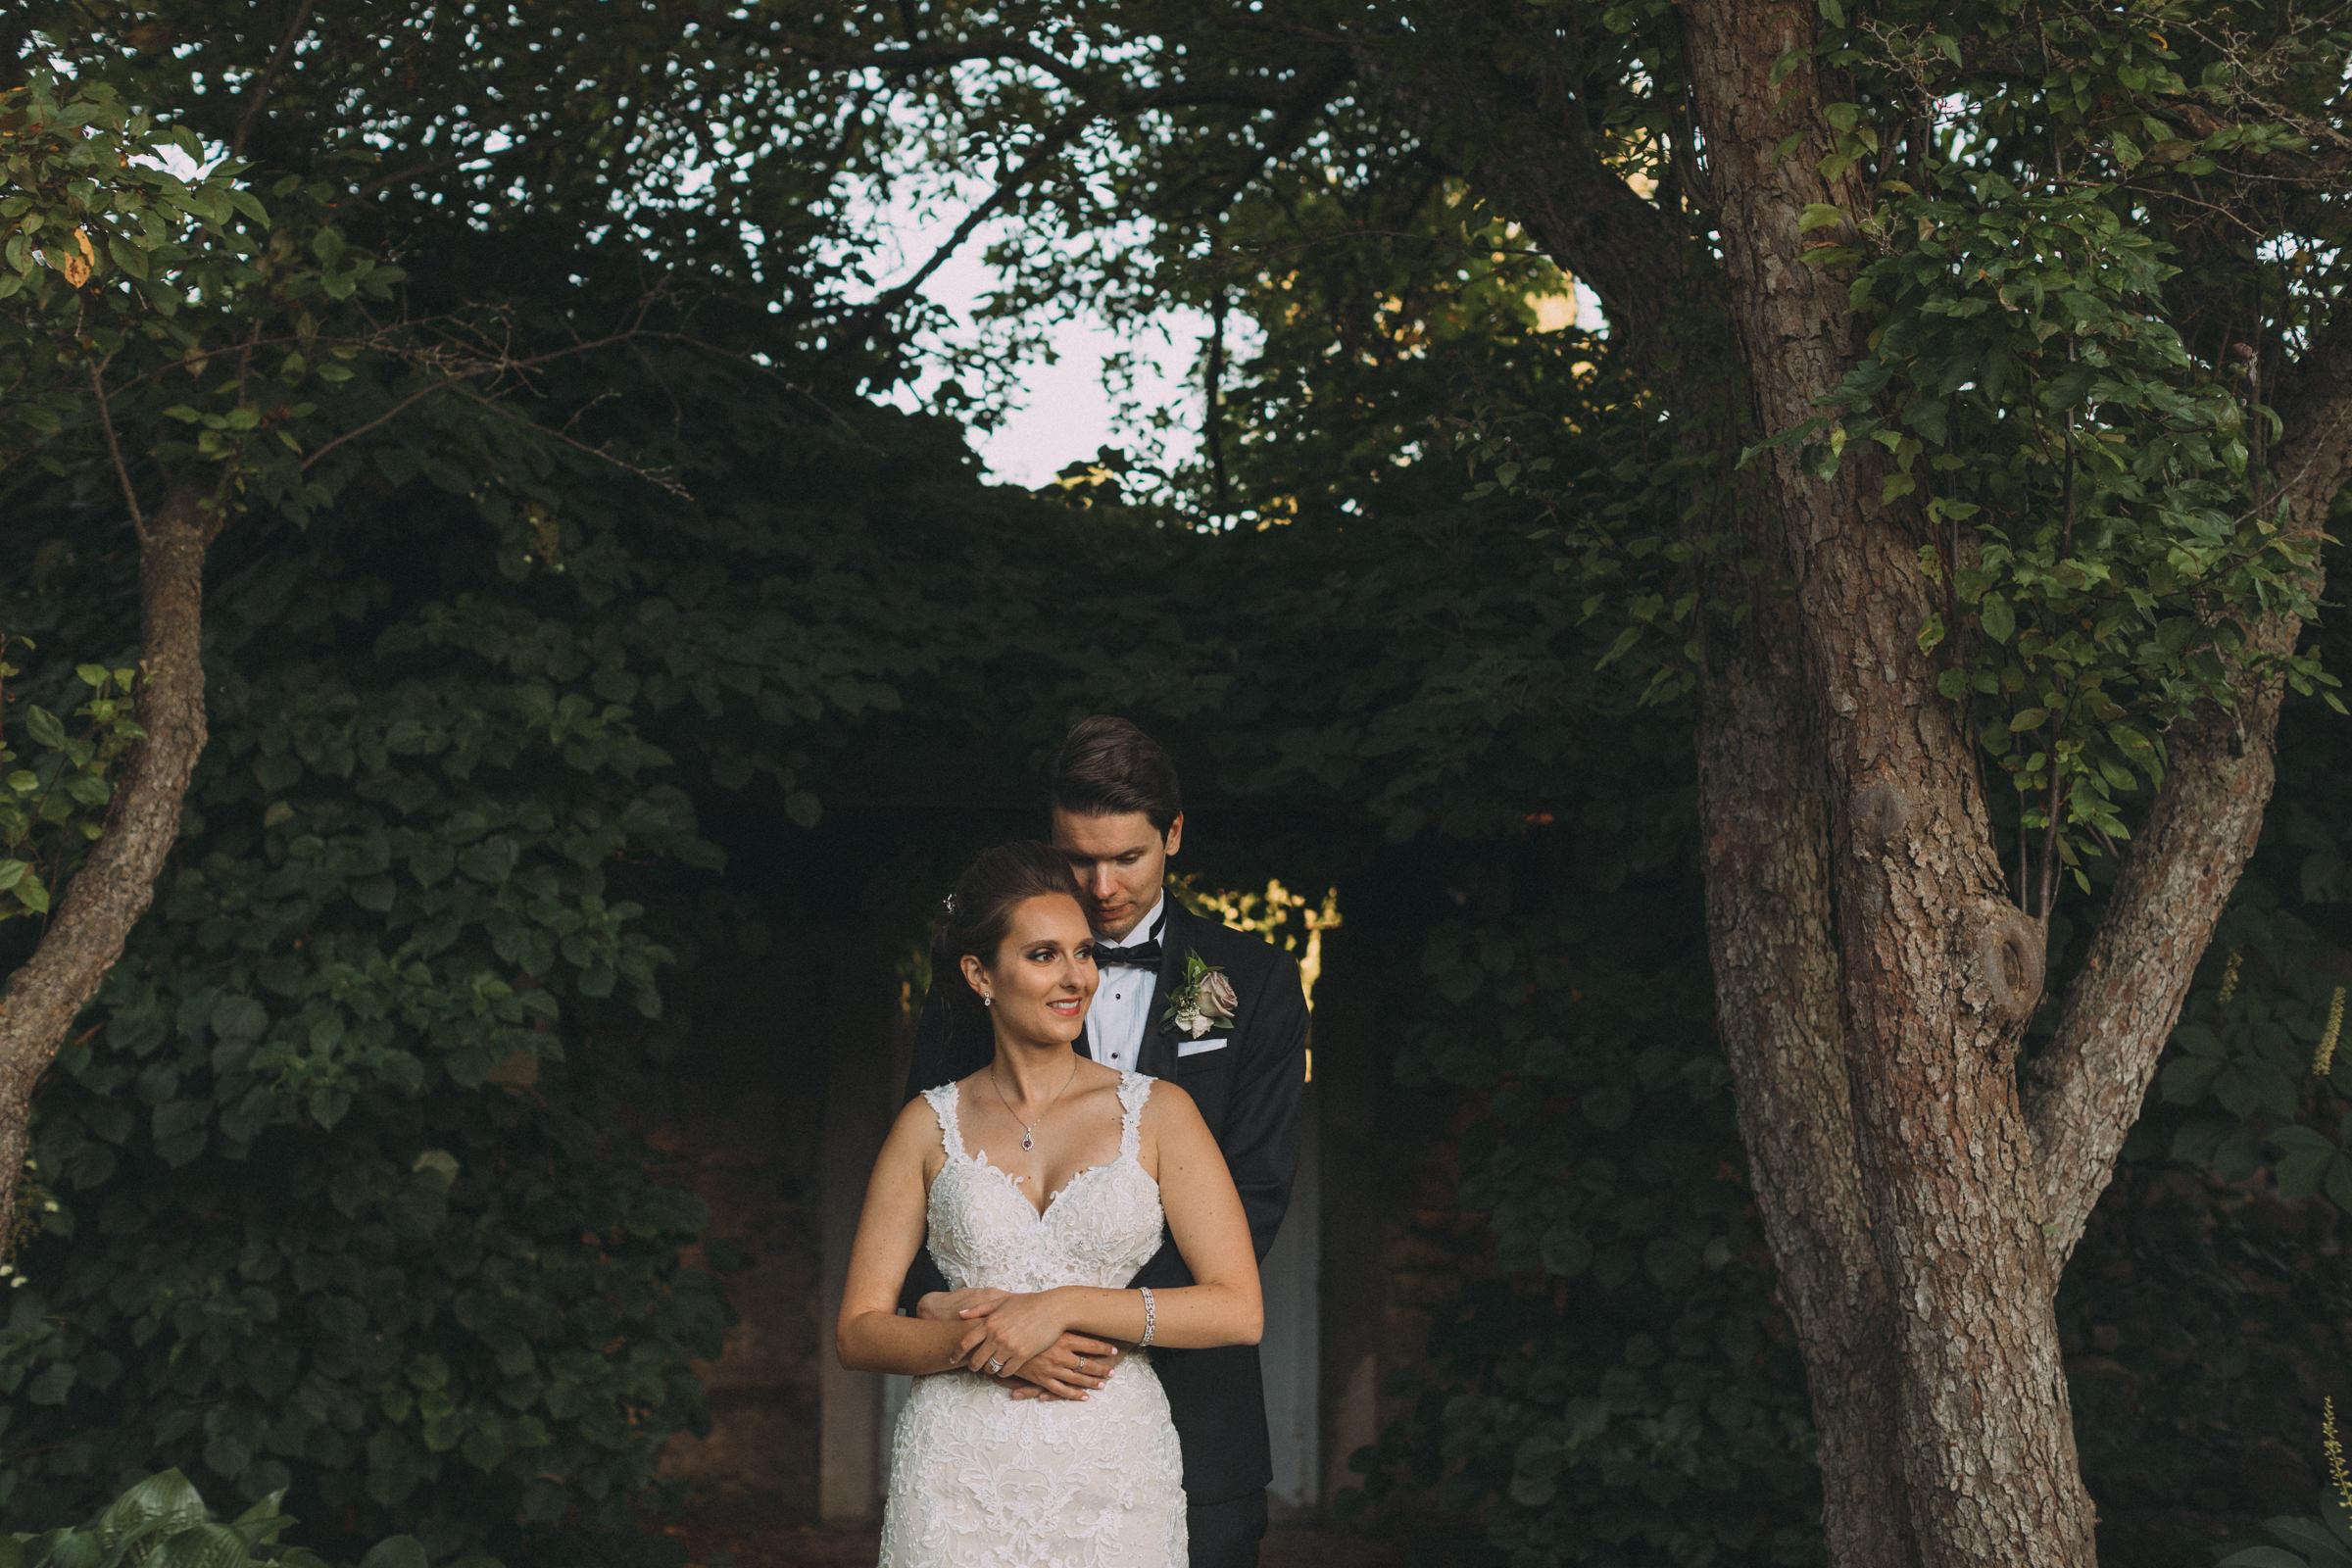 Langdon-Hall-wedding-photography-Cambridge-by-Sam-Wong-of-Visual-Cravings_Sarah-Ryan_23.jpg